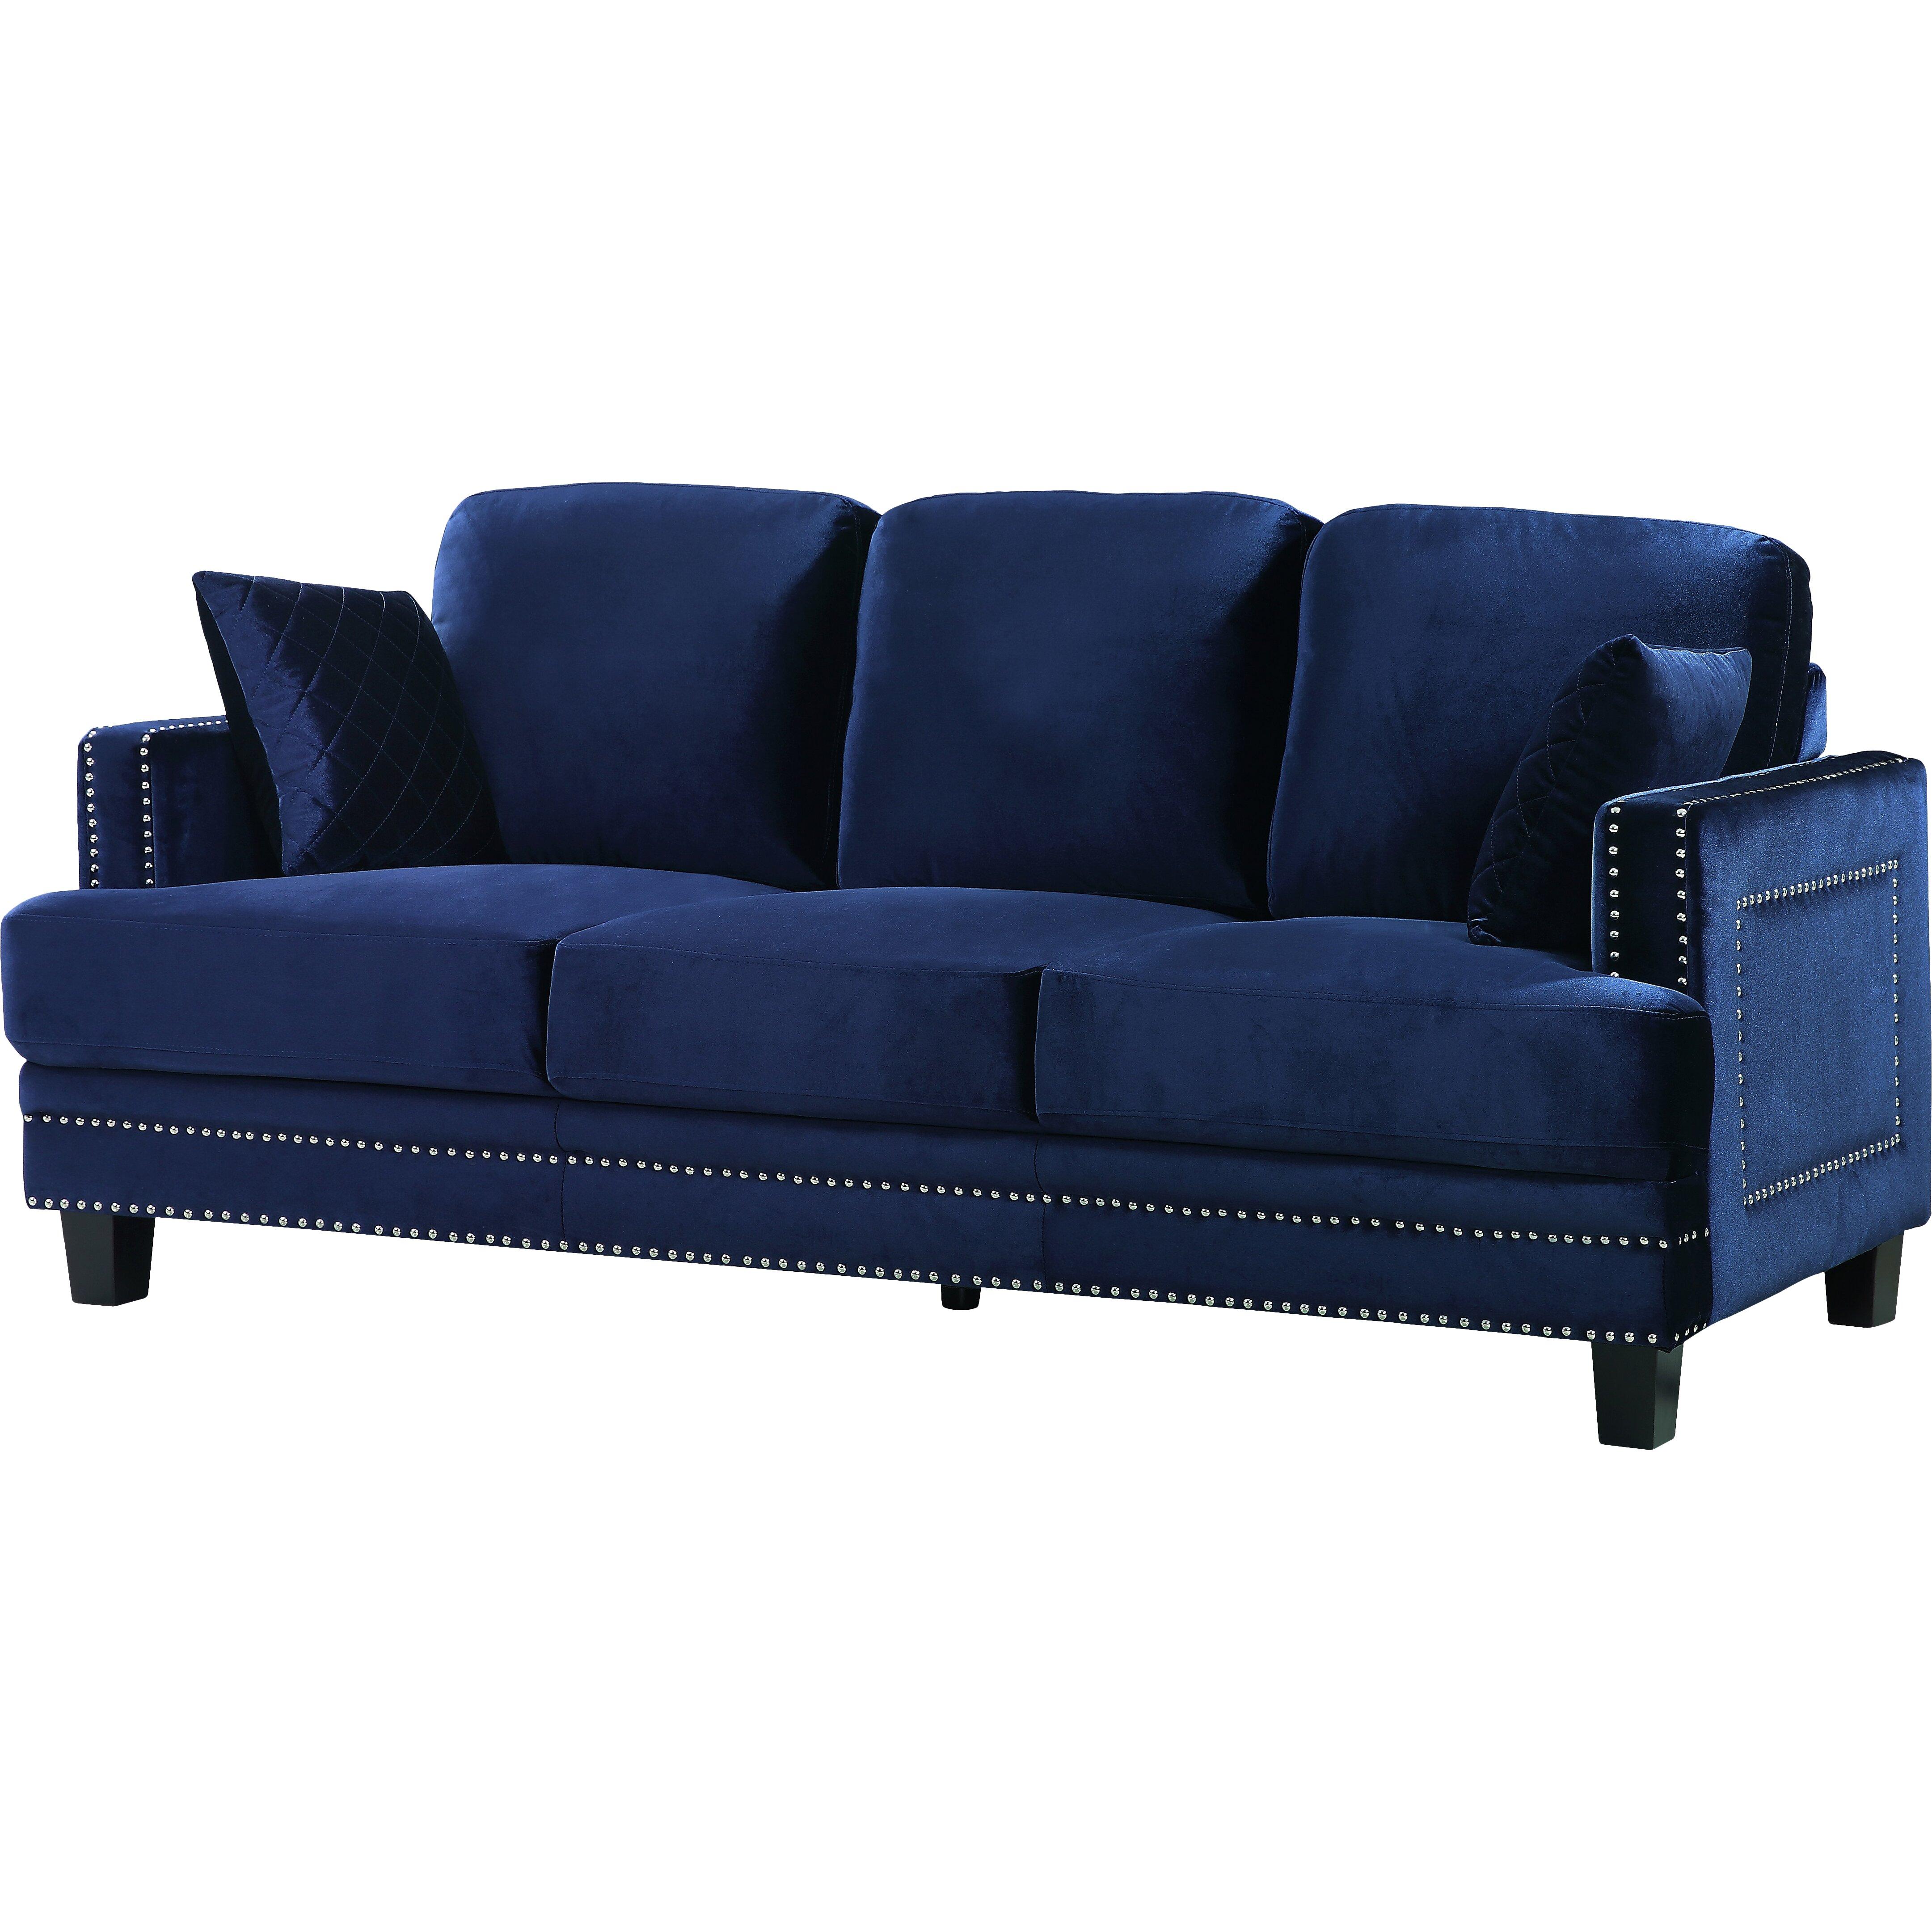 Meridian Furniture Usa Ferrara Nailhead Sofa Reviews Wayfair